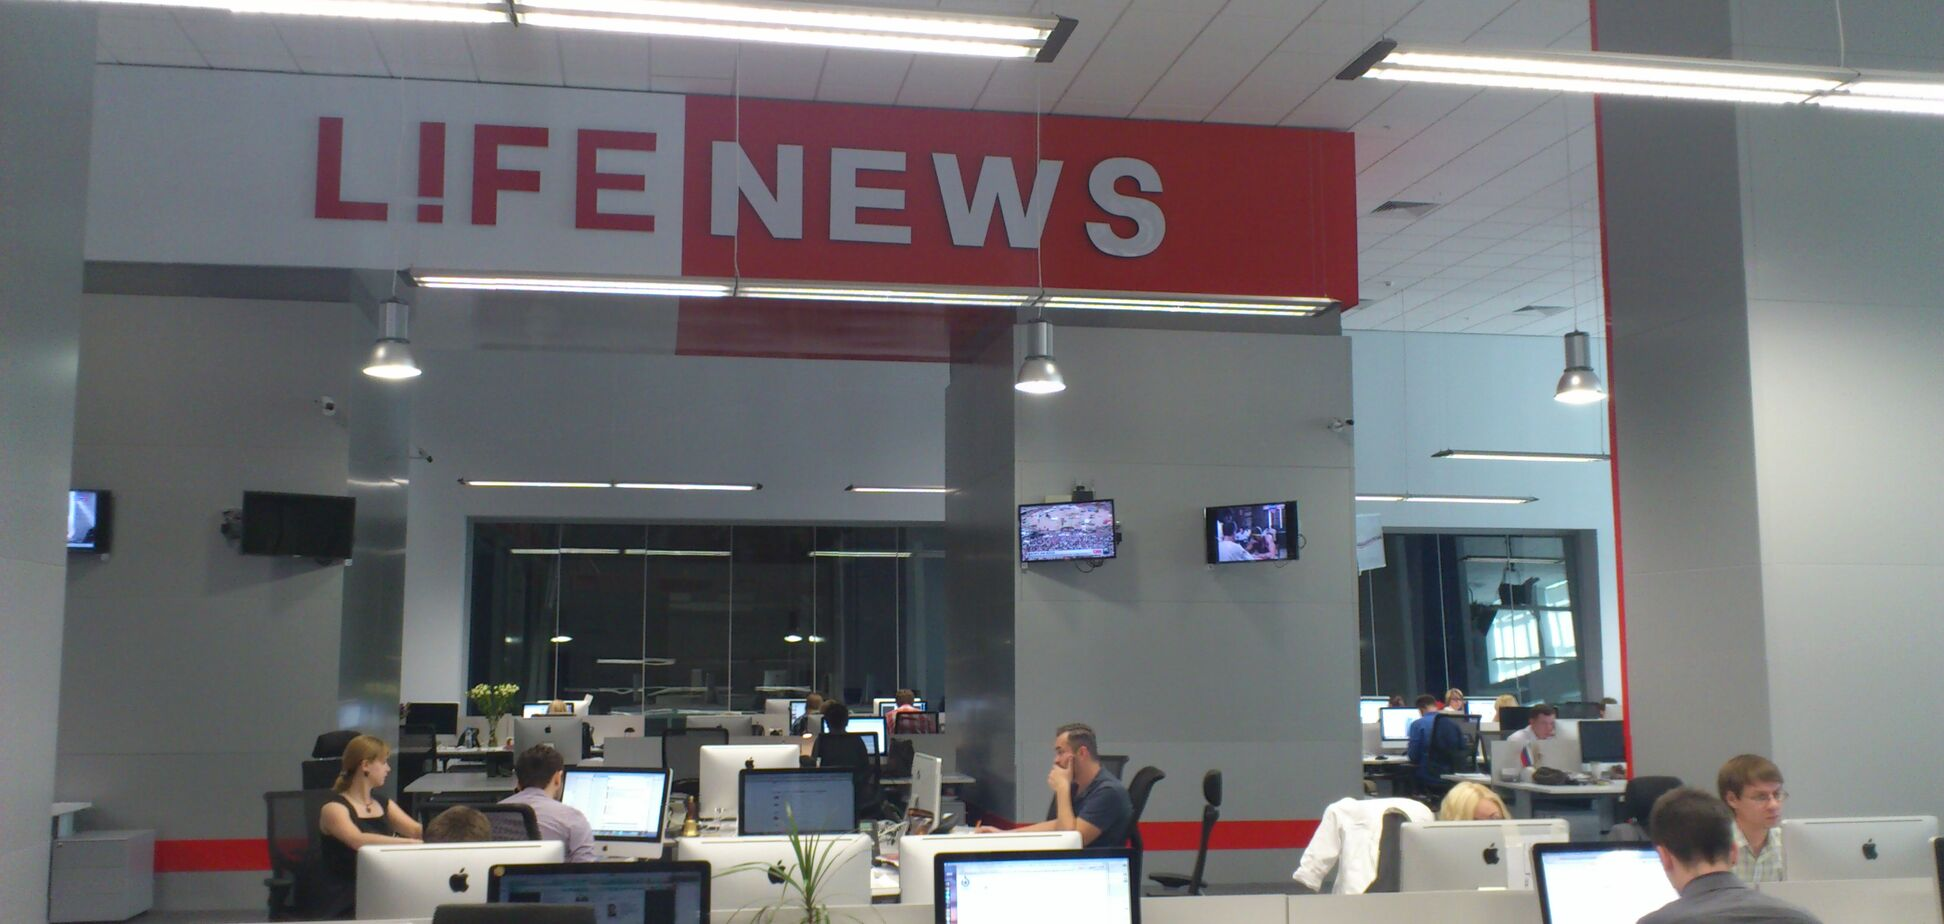 Lifenews - сдох